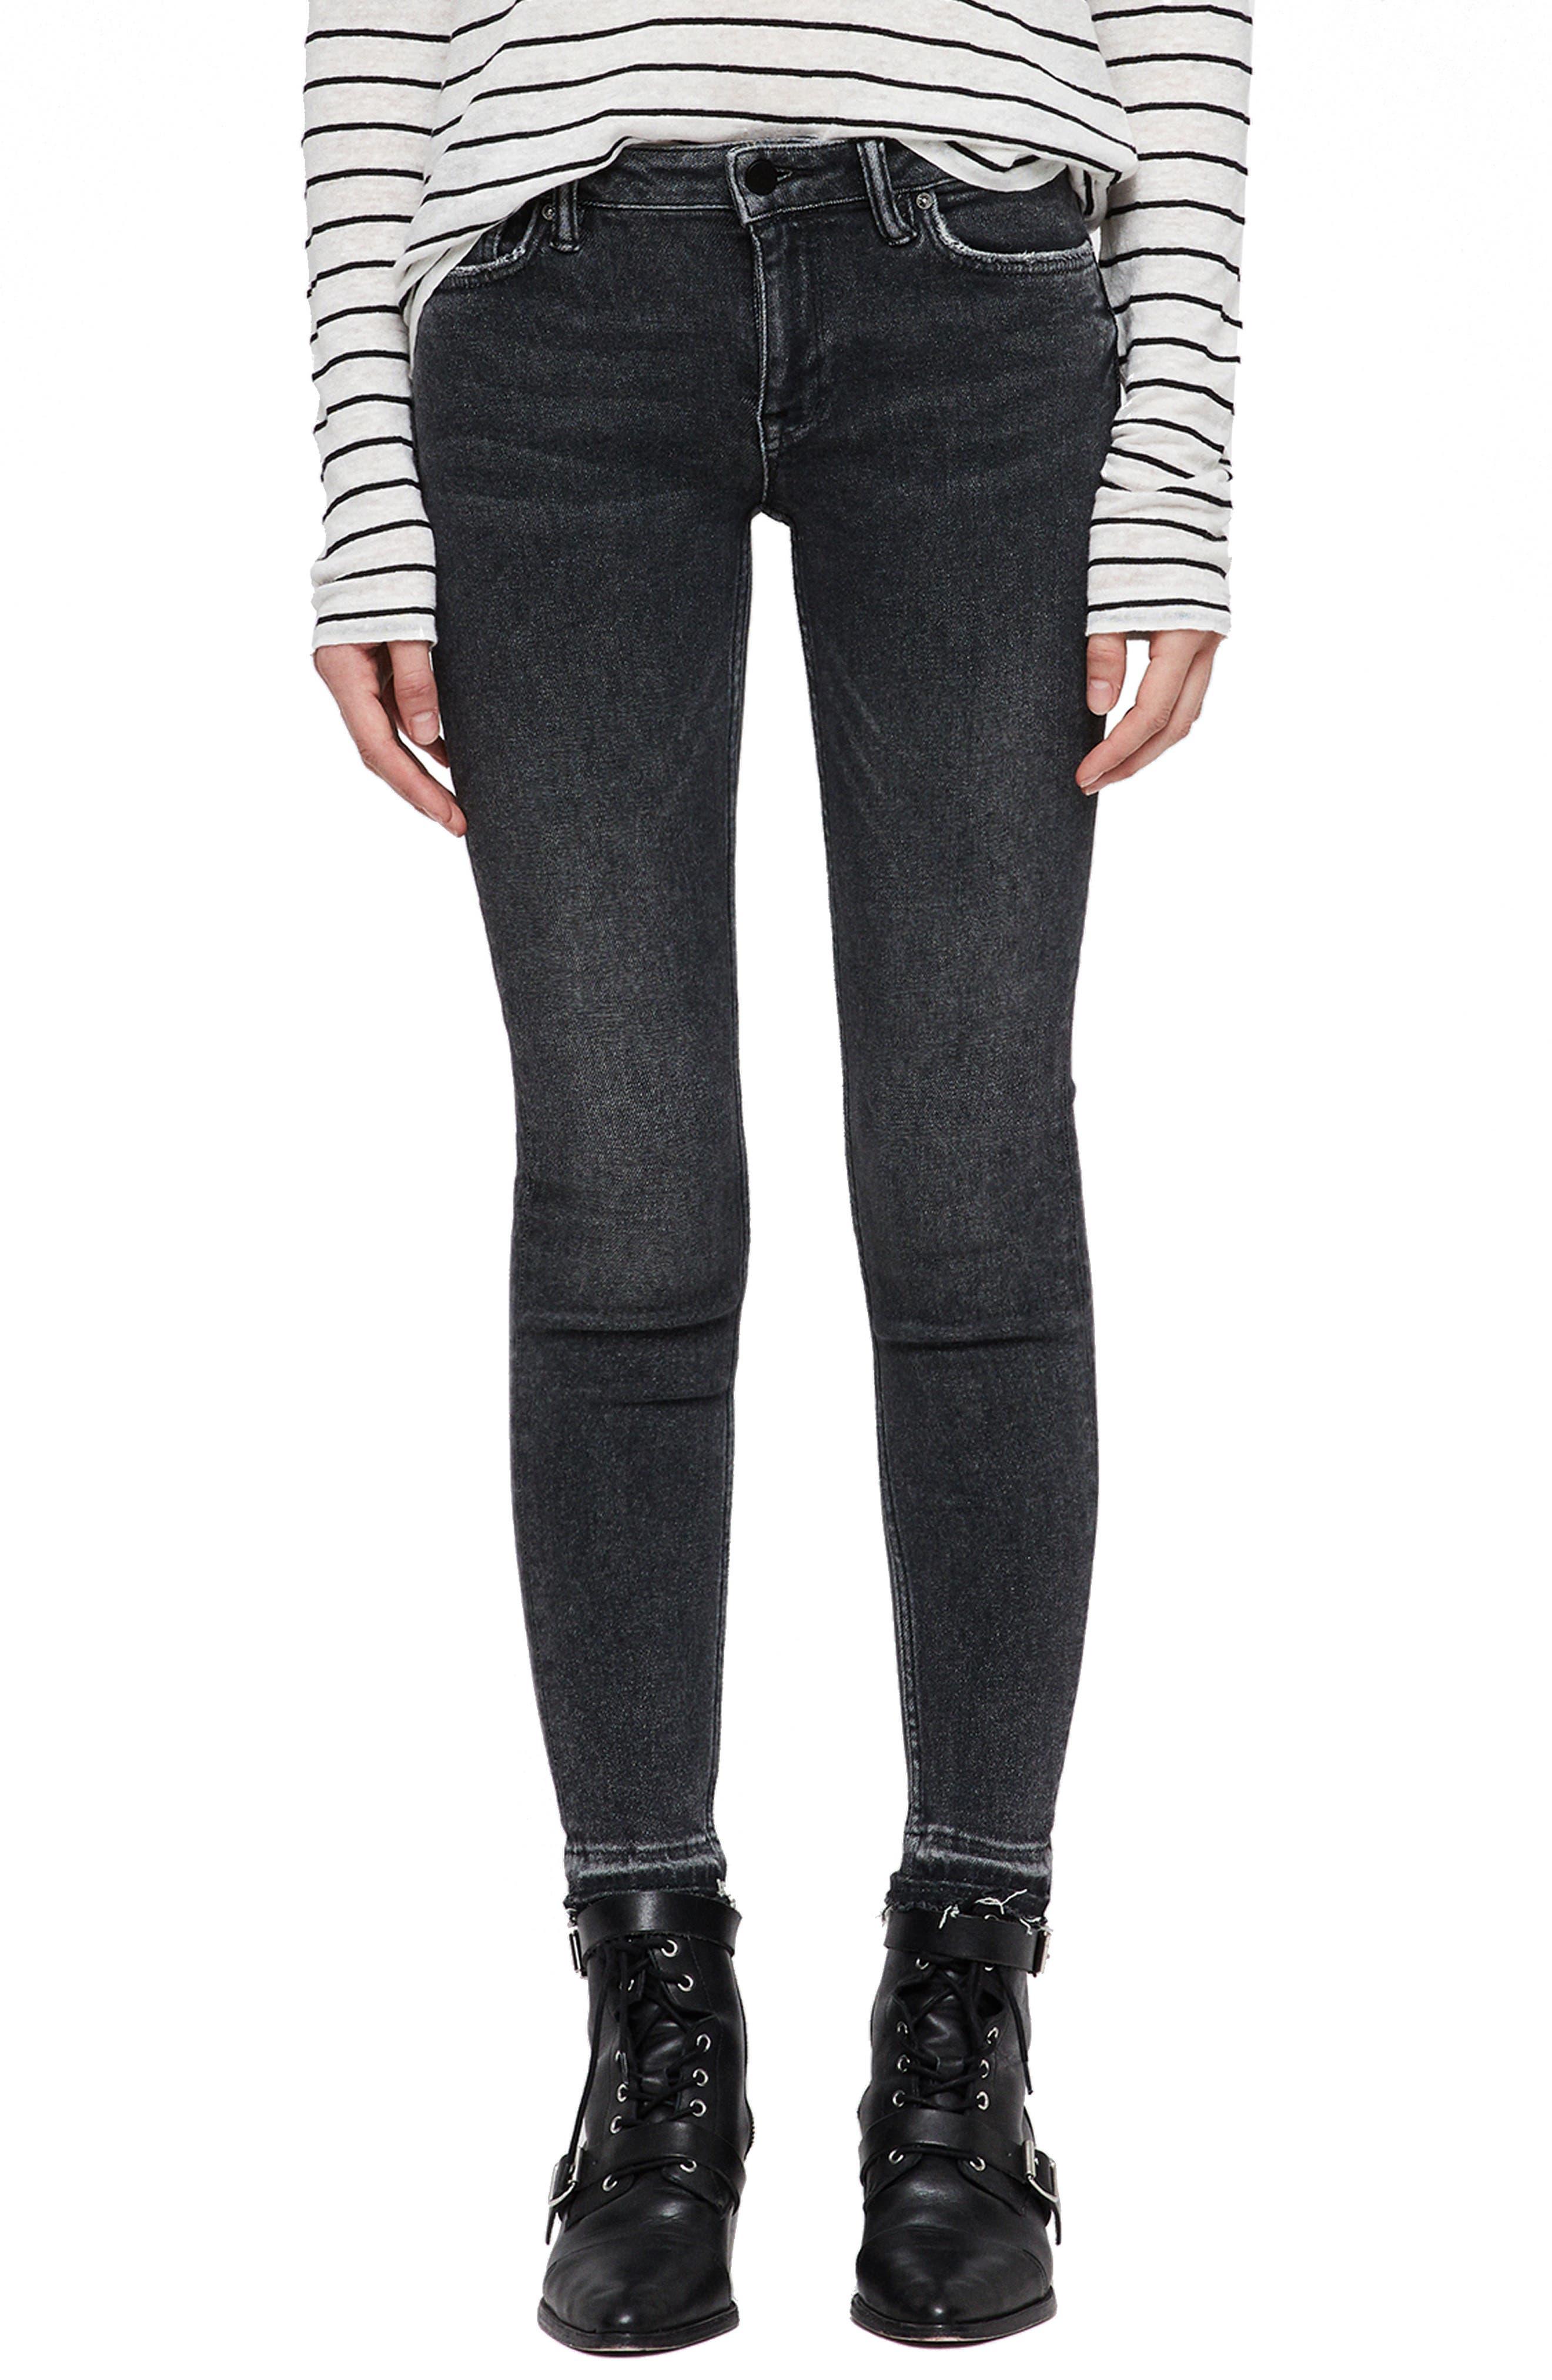 Mast Ankle Skinny Jeans,                         Main,                         color, WASHED BLACK